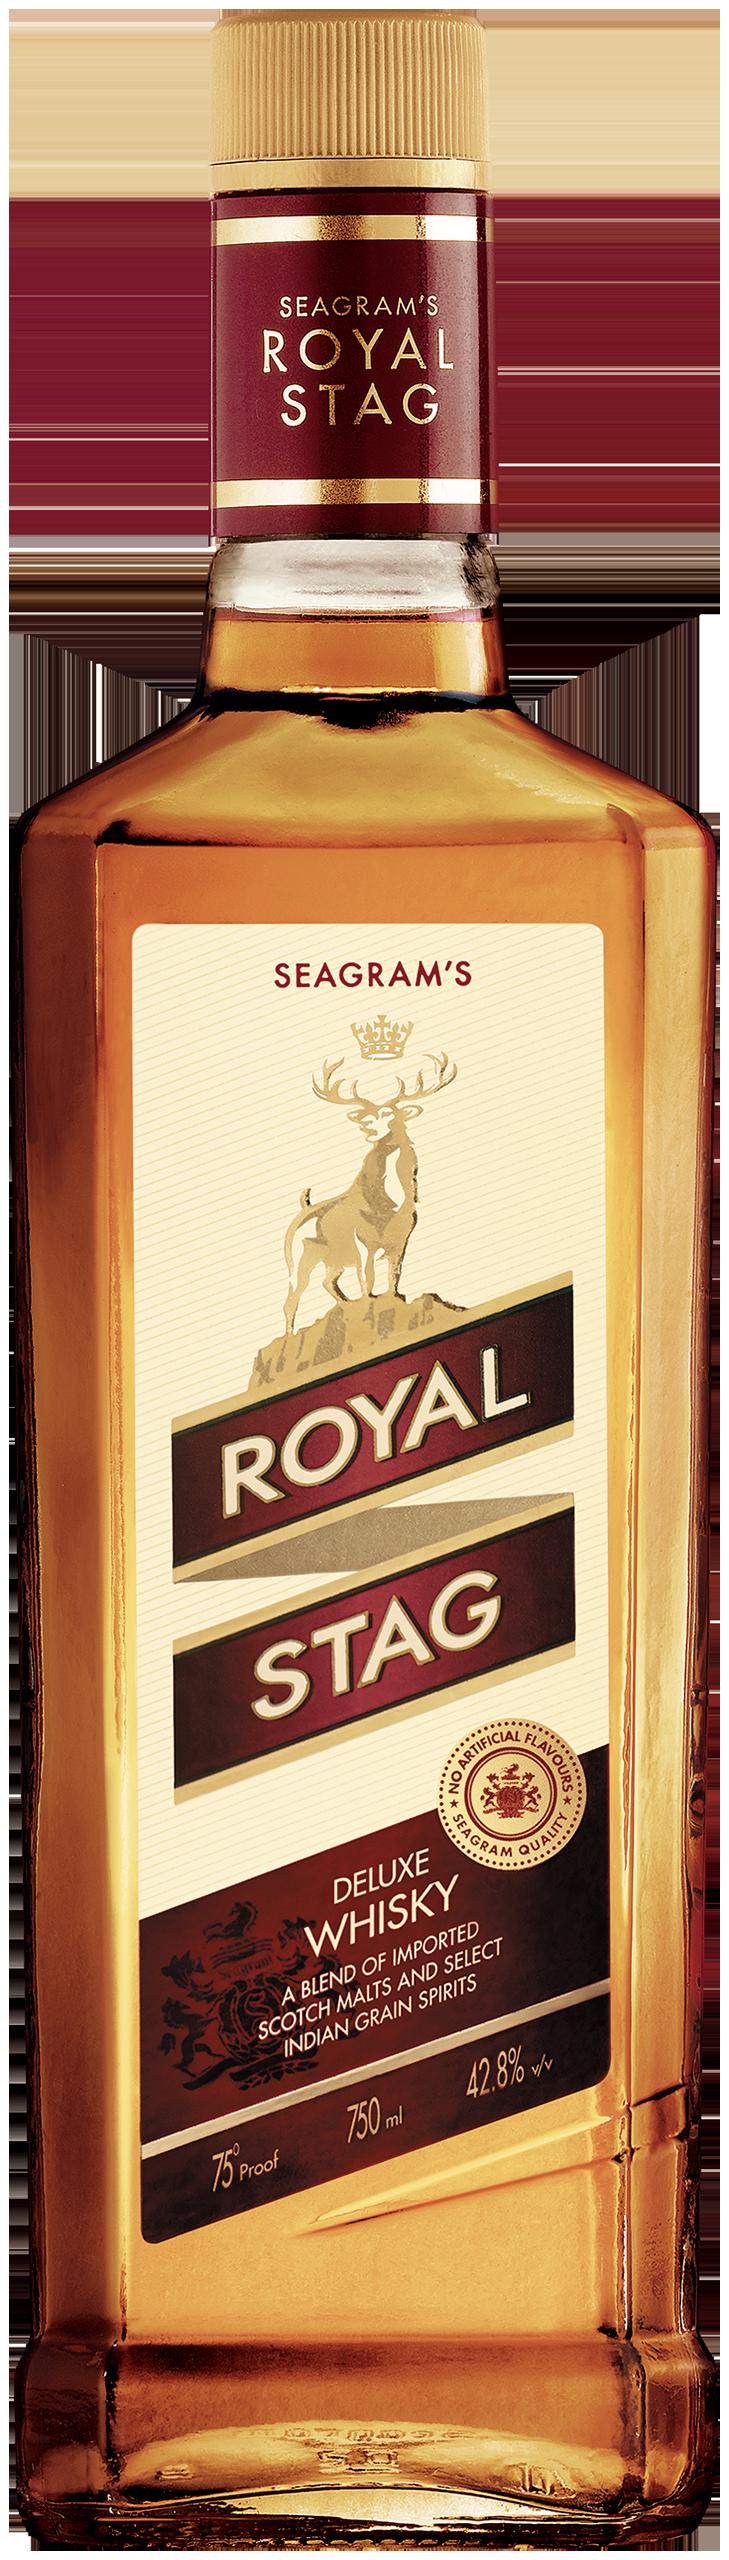 Packshot Royal Stag